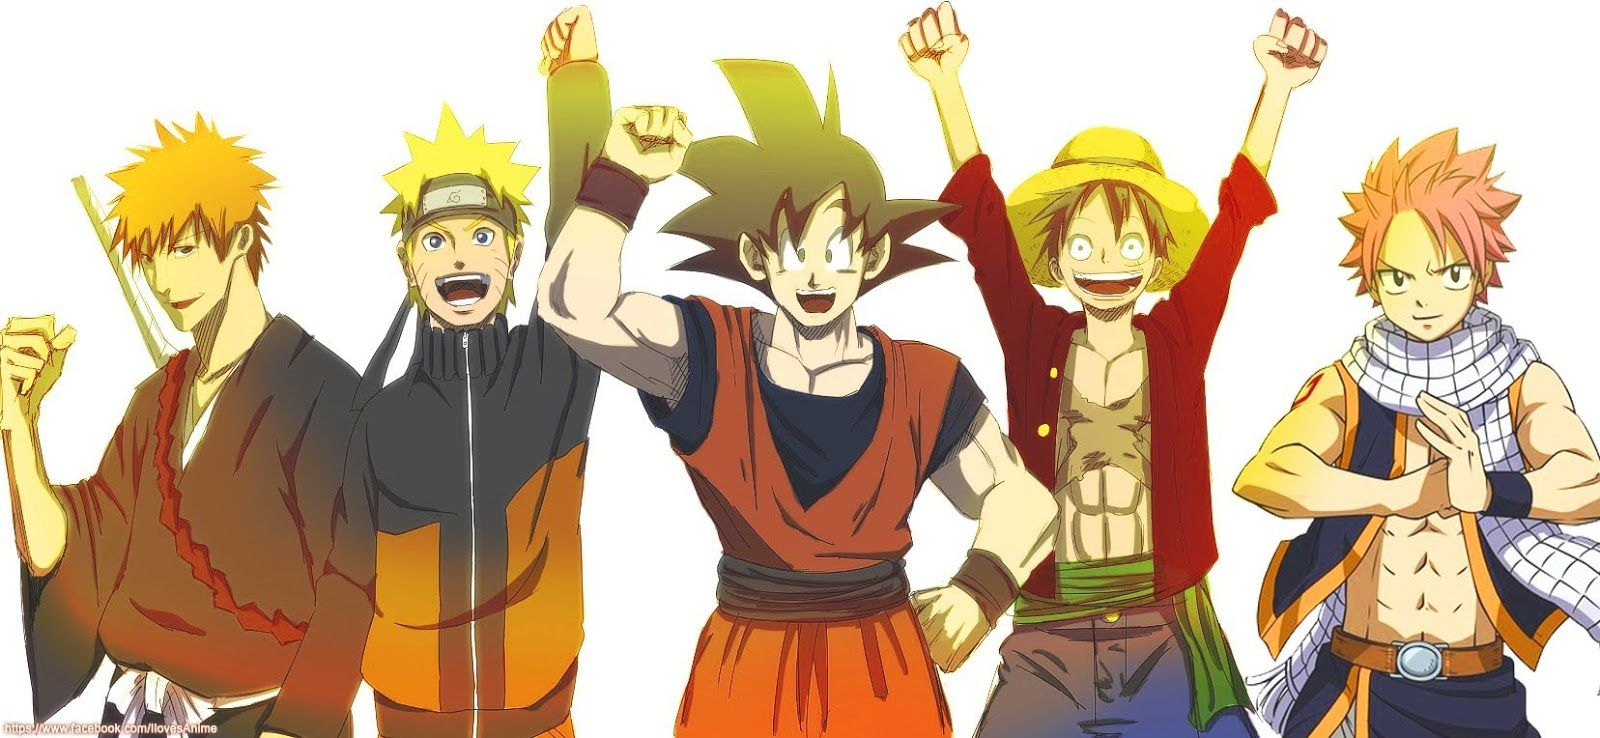 Goku Naruto Luffy Ichigo Natsu Buscar Con Google Manga Celebre Anime Gratuit Dessin Anime